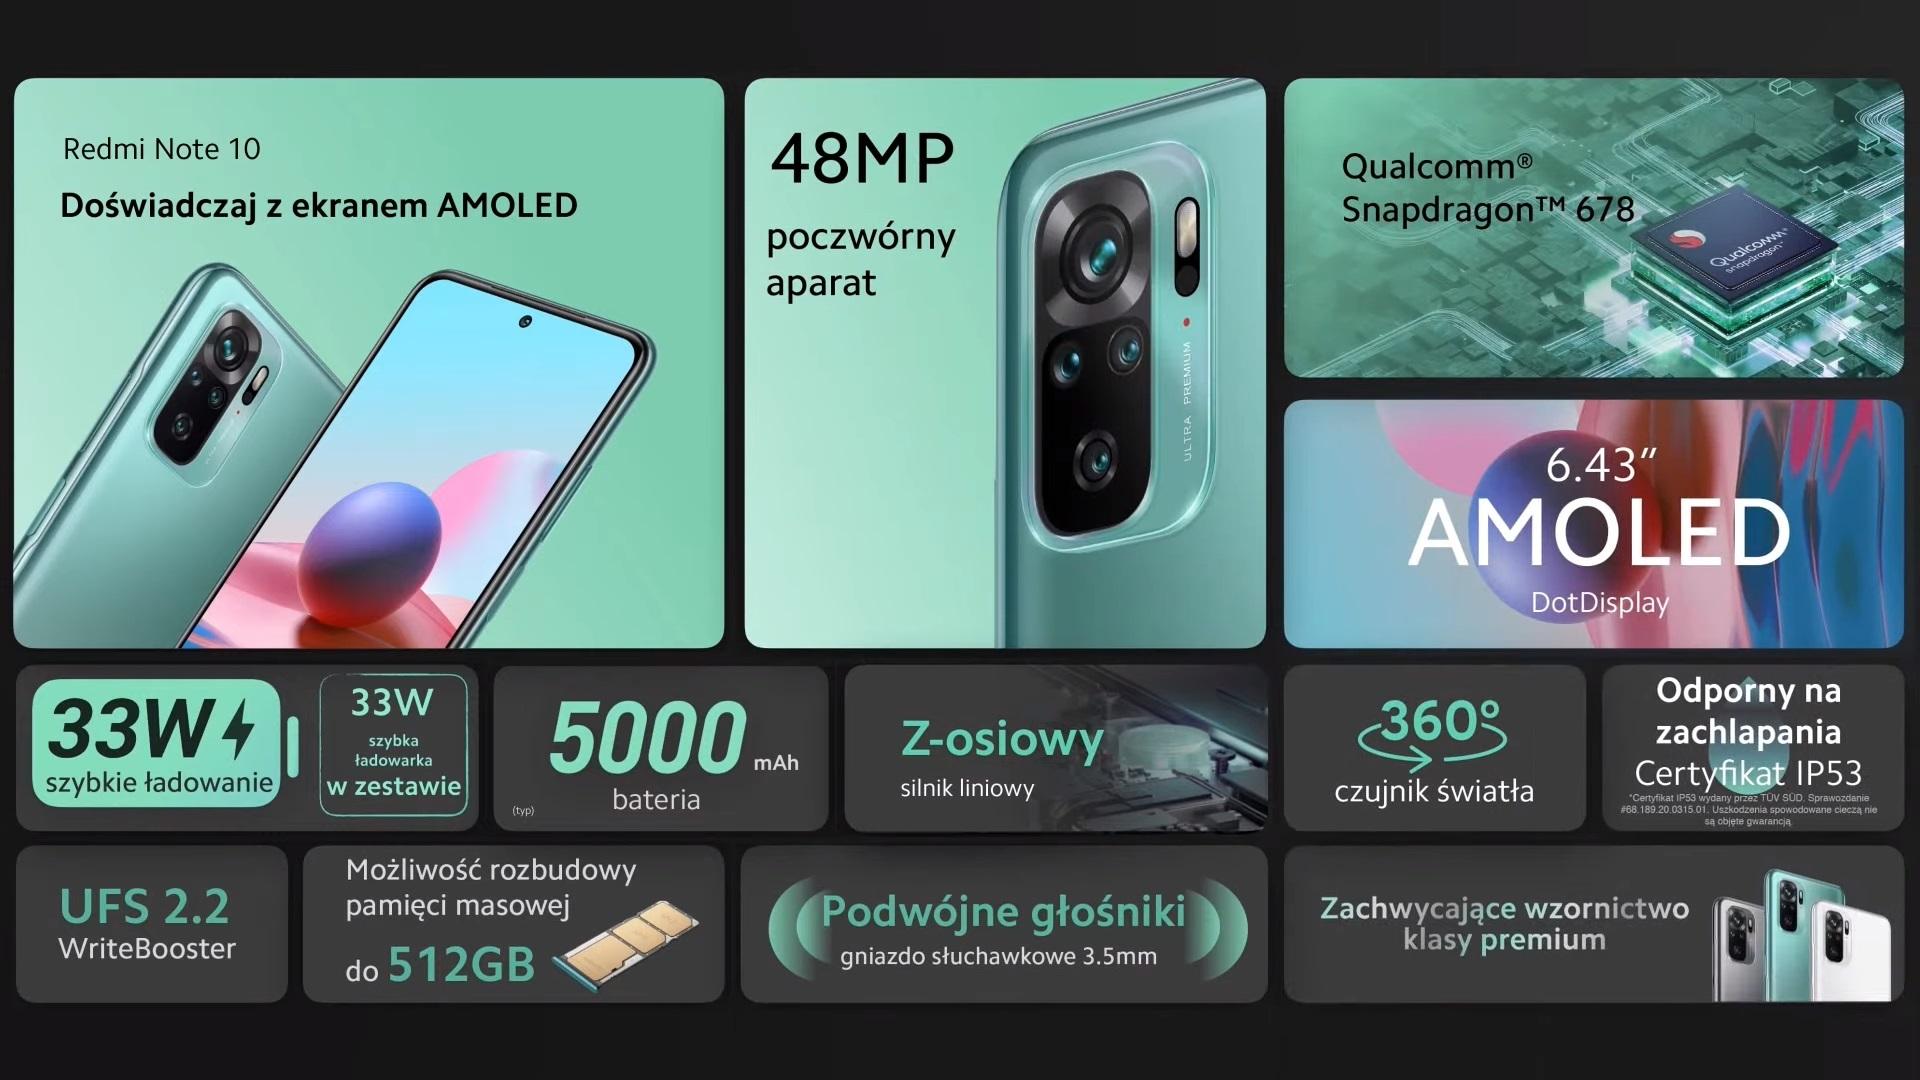 smartfon Redmi Note 10 smartphone specyfikacja